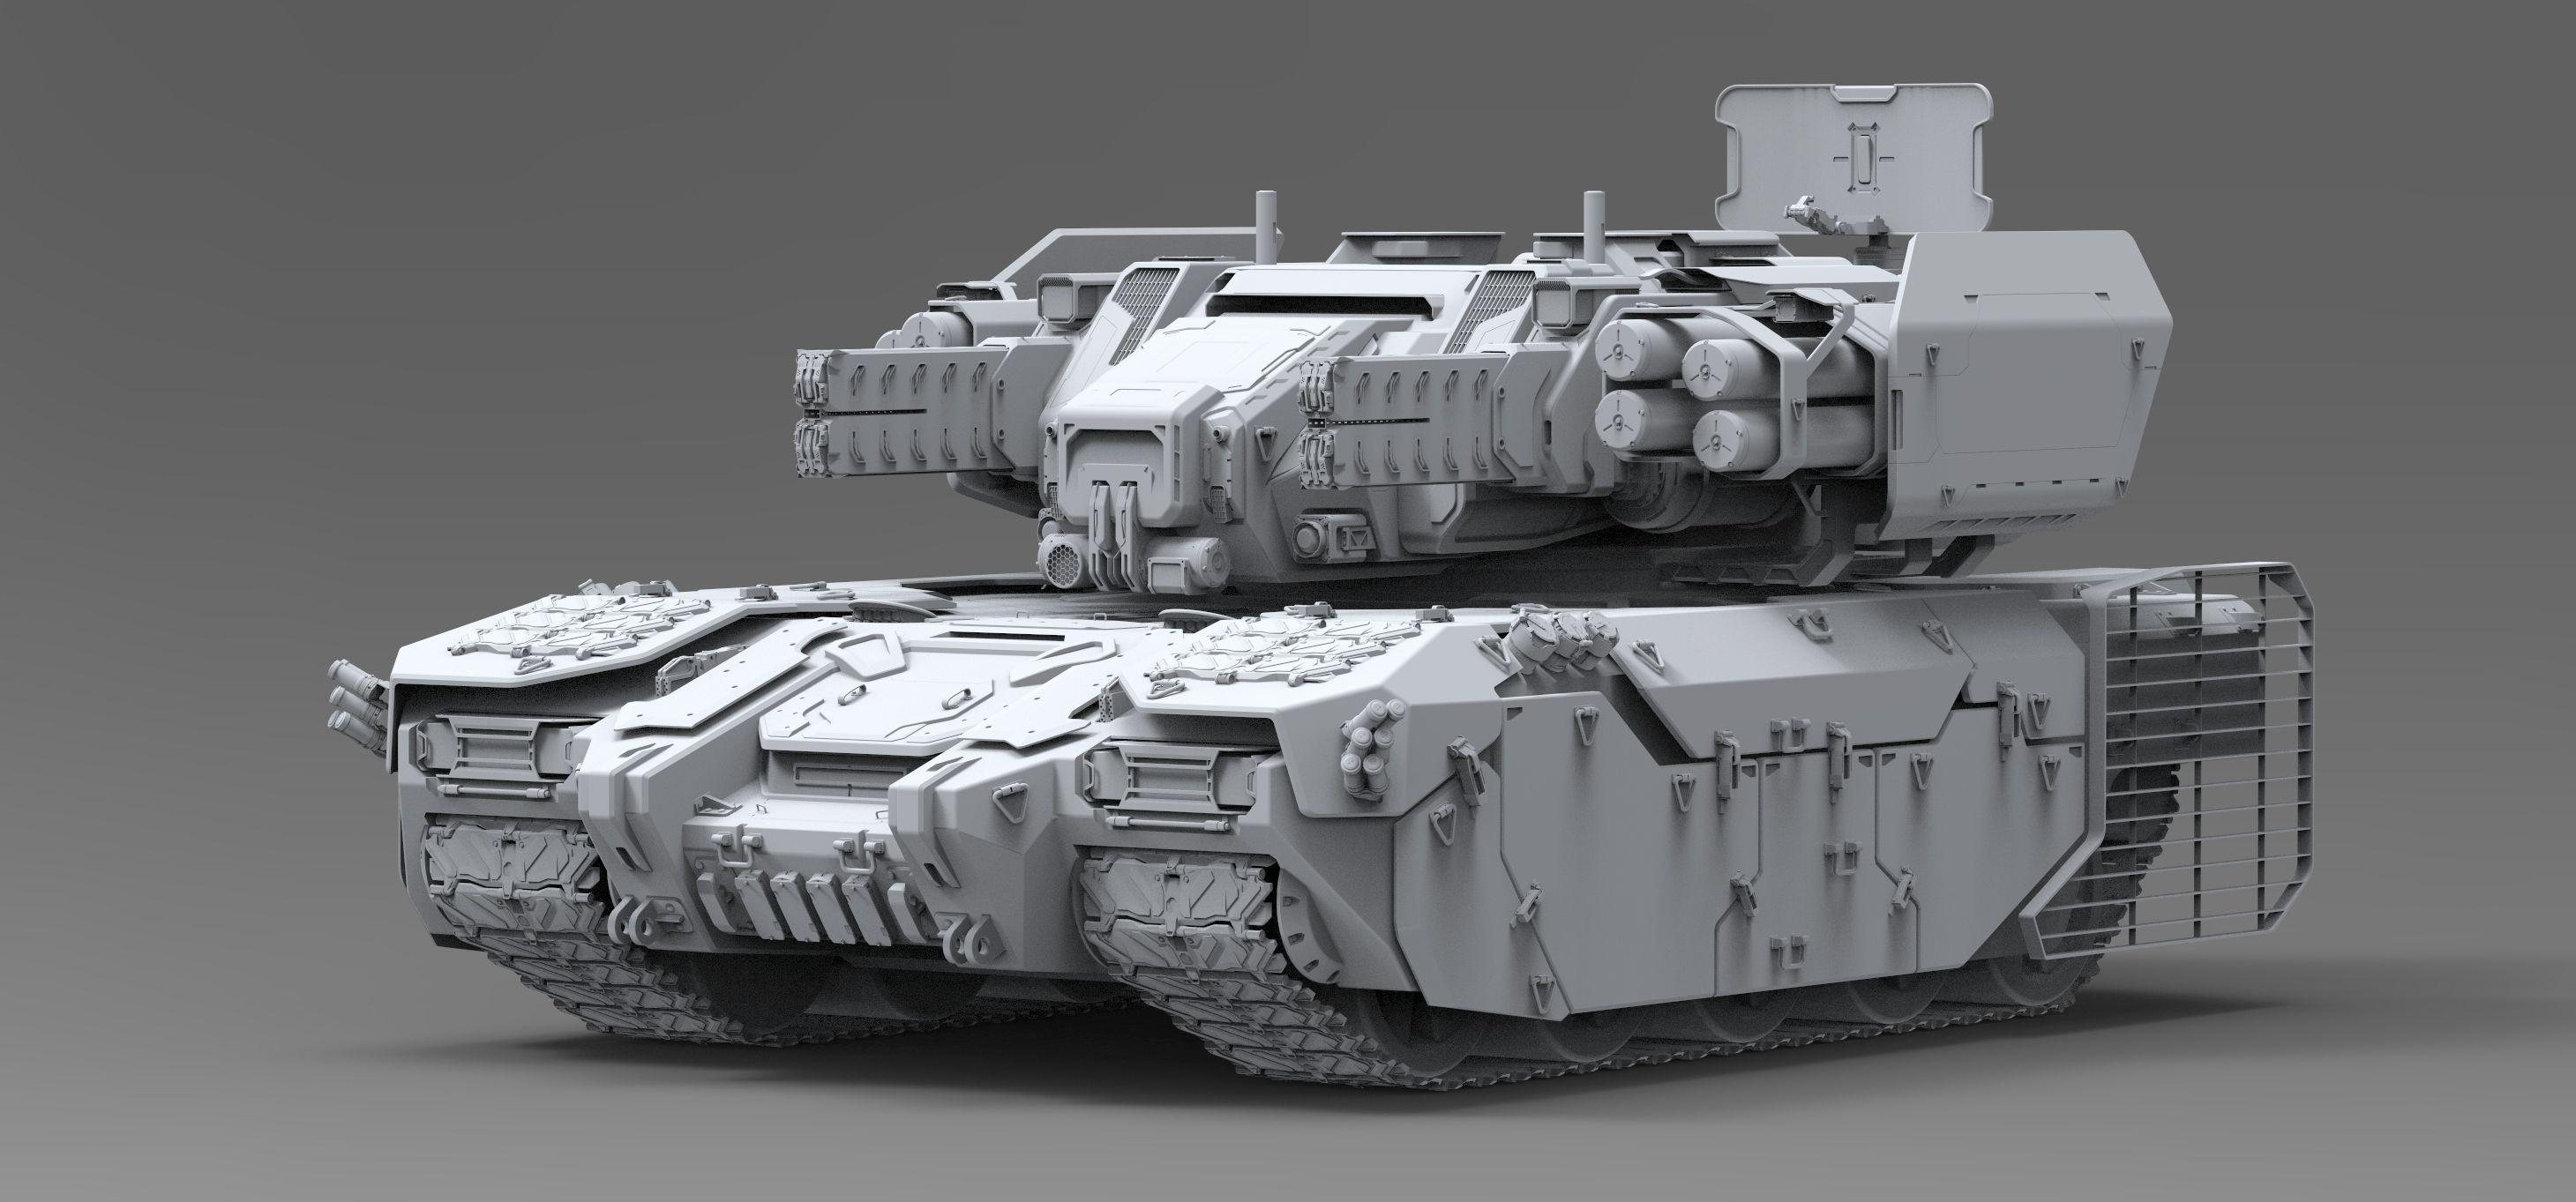 Zprk-tron-3500-3500